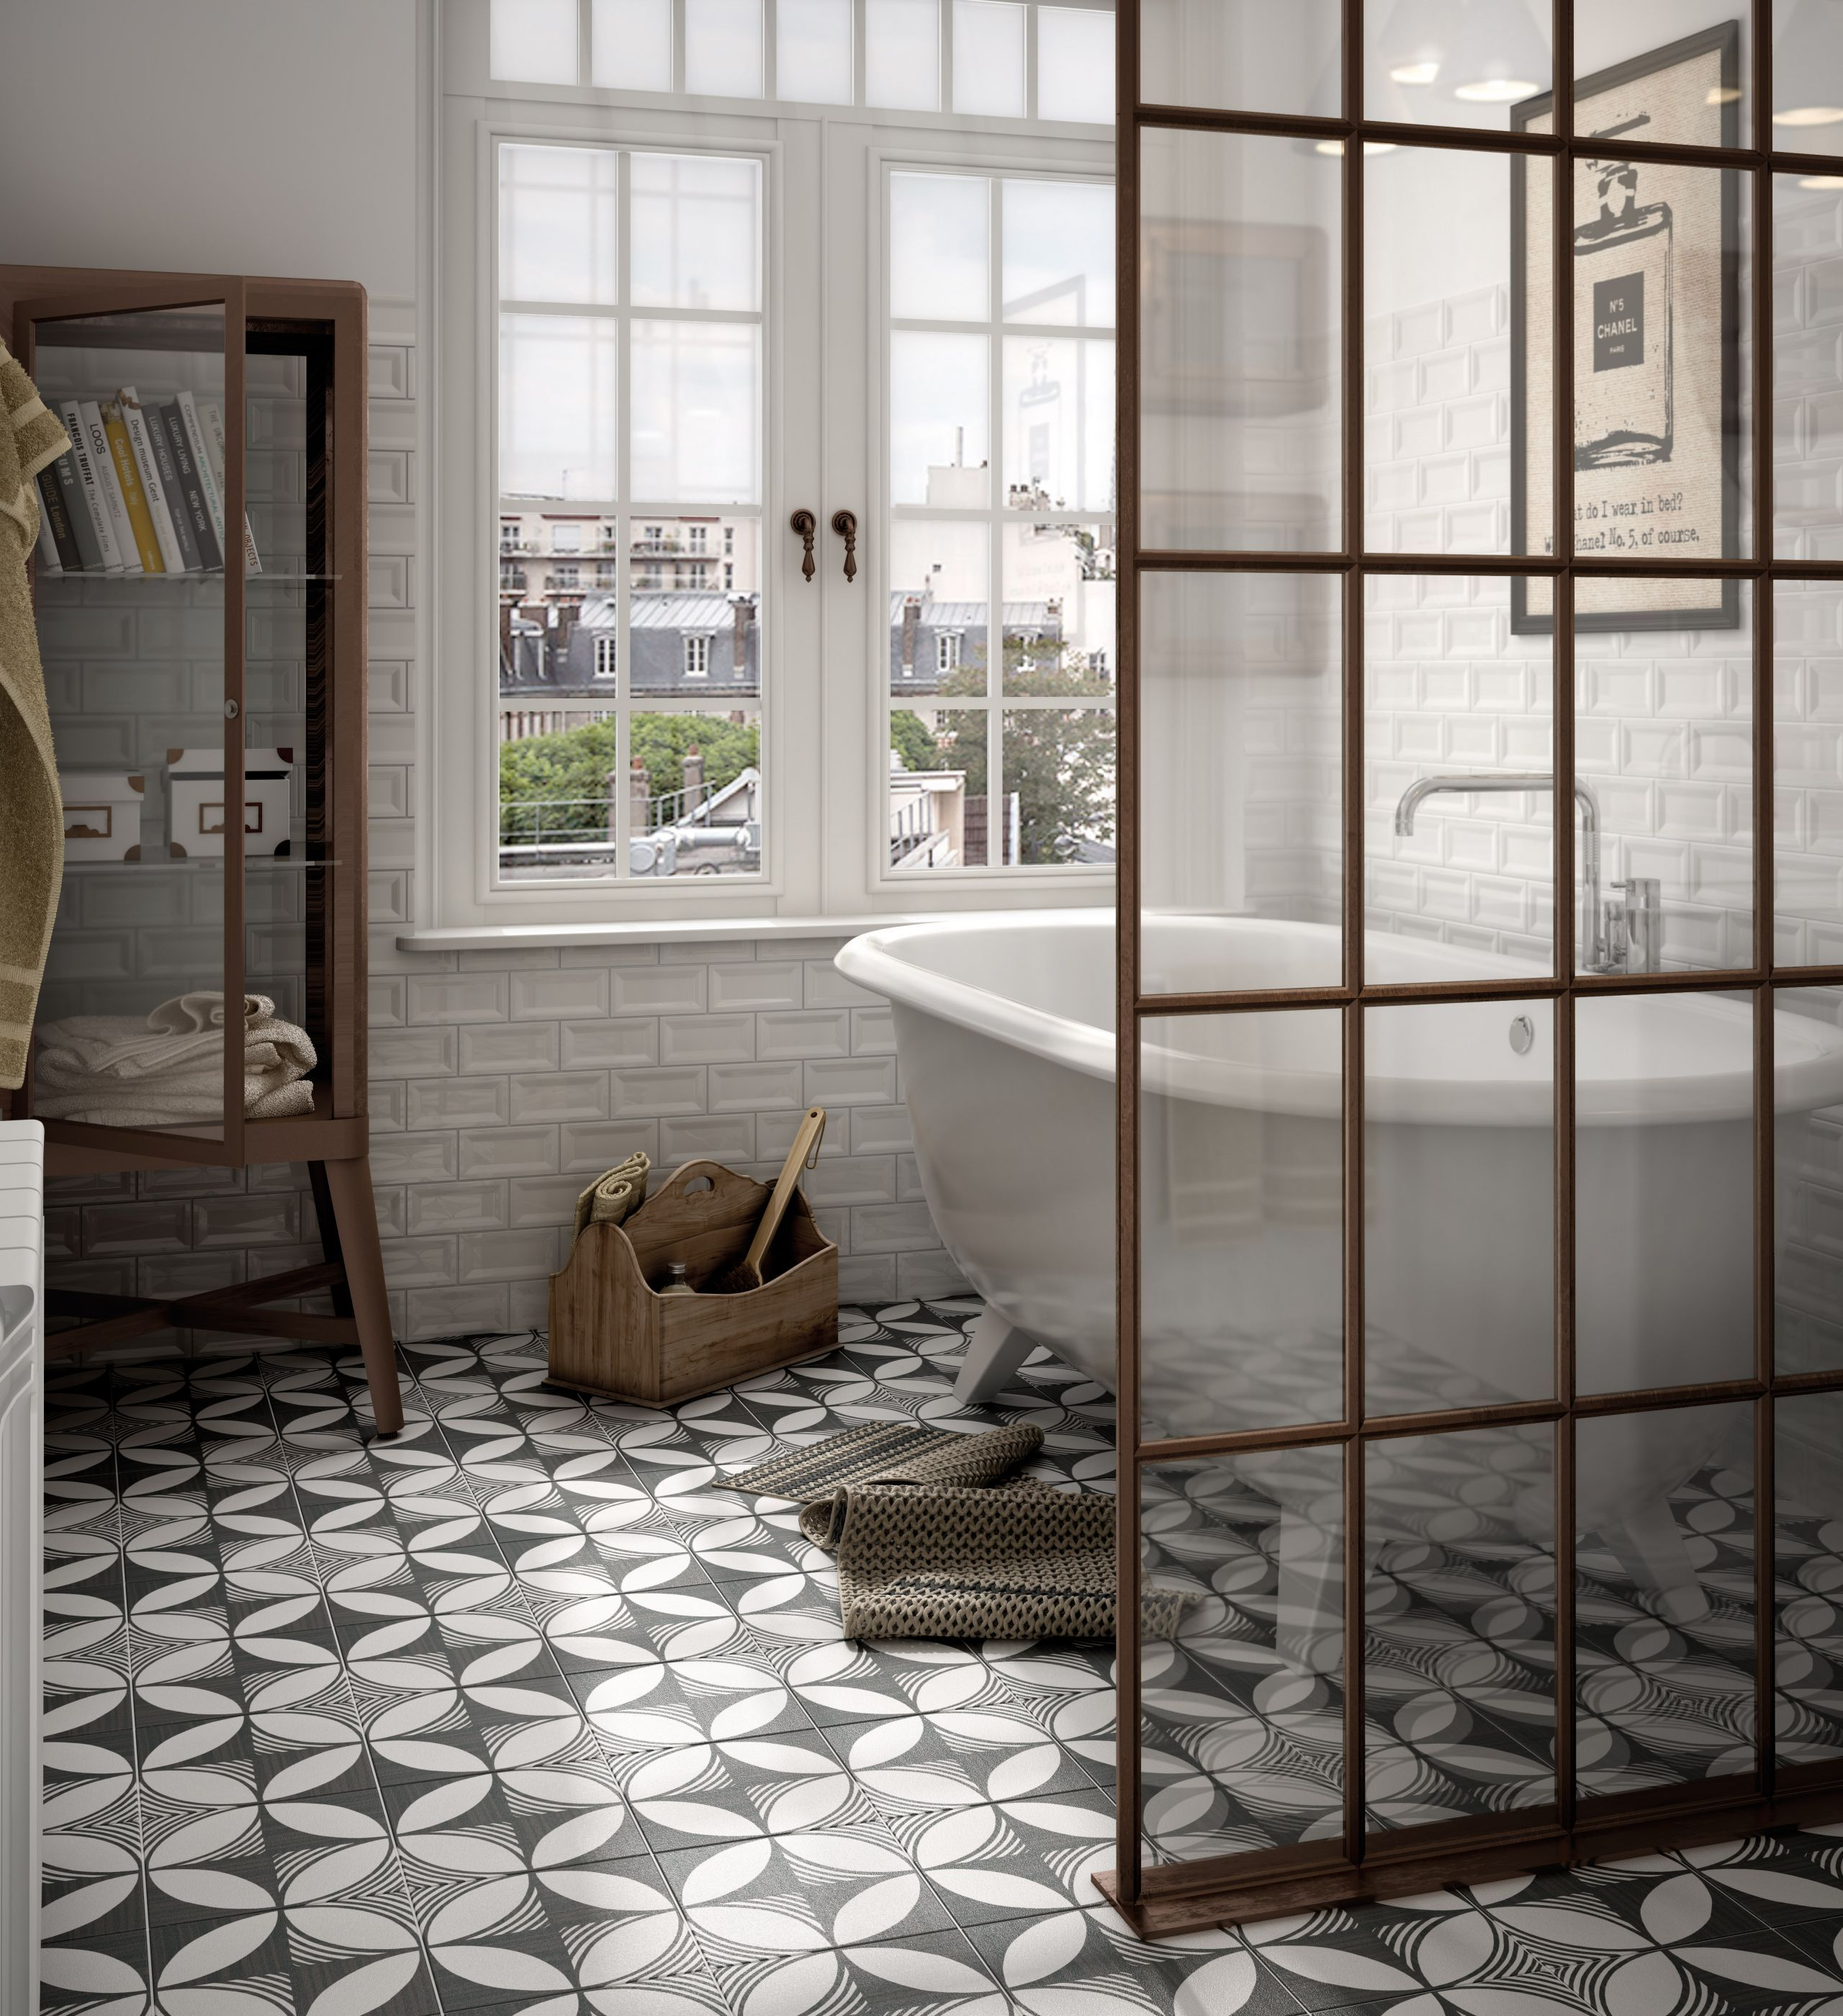 25 En Suite Ideas Looks Trends And Tips To Inspire Stylish Bathroom Bathroom Interior Bathroom Interior Design